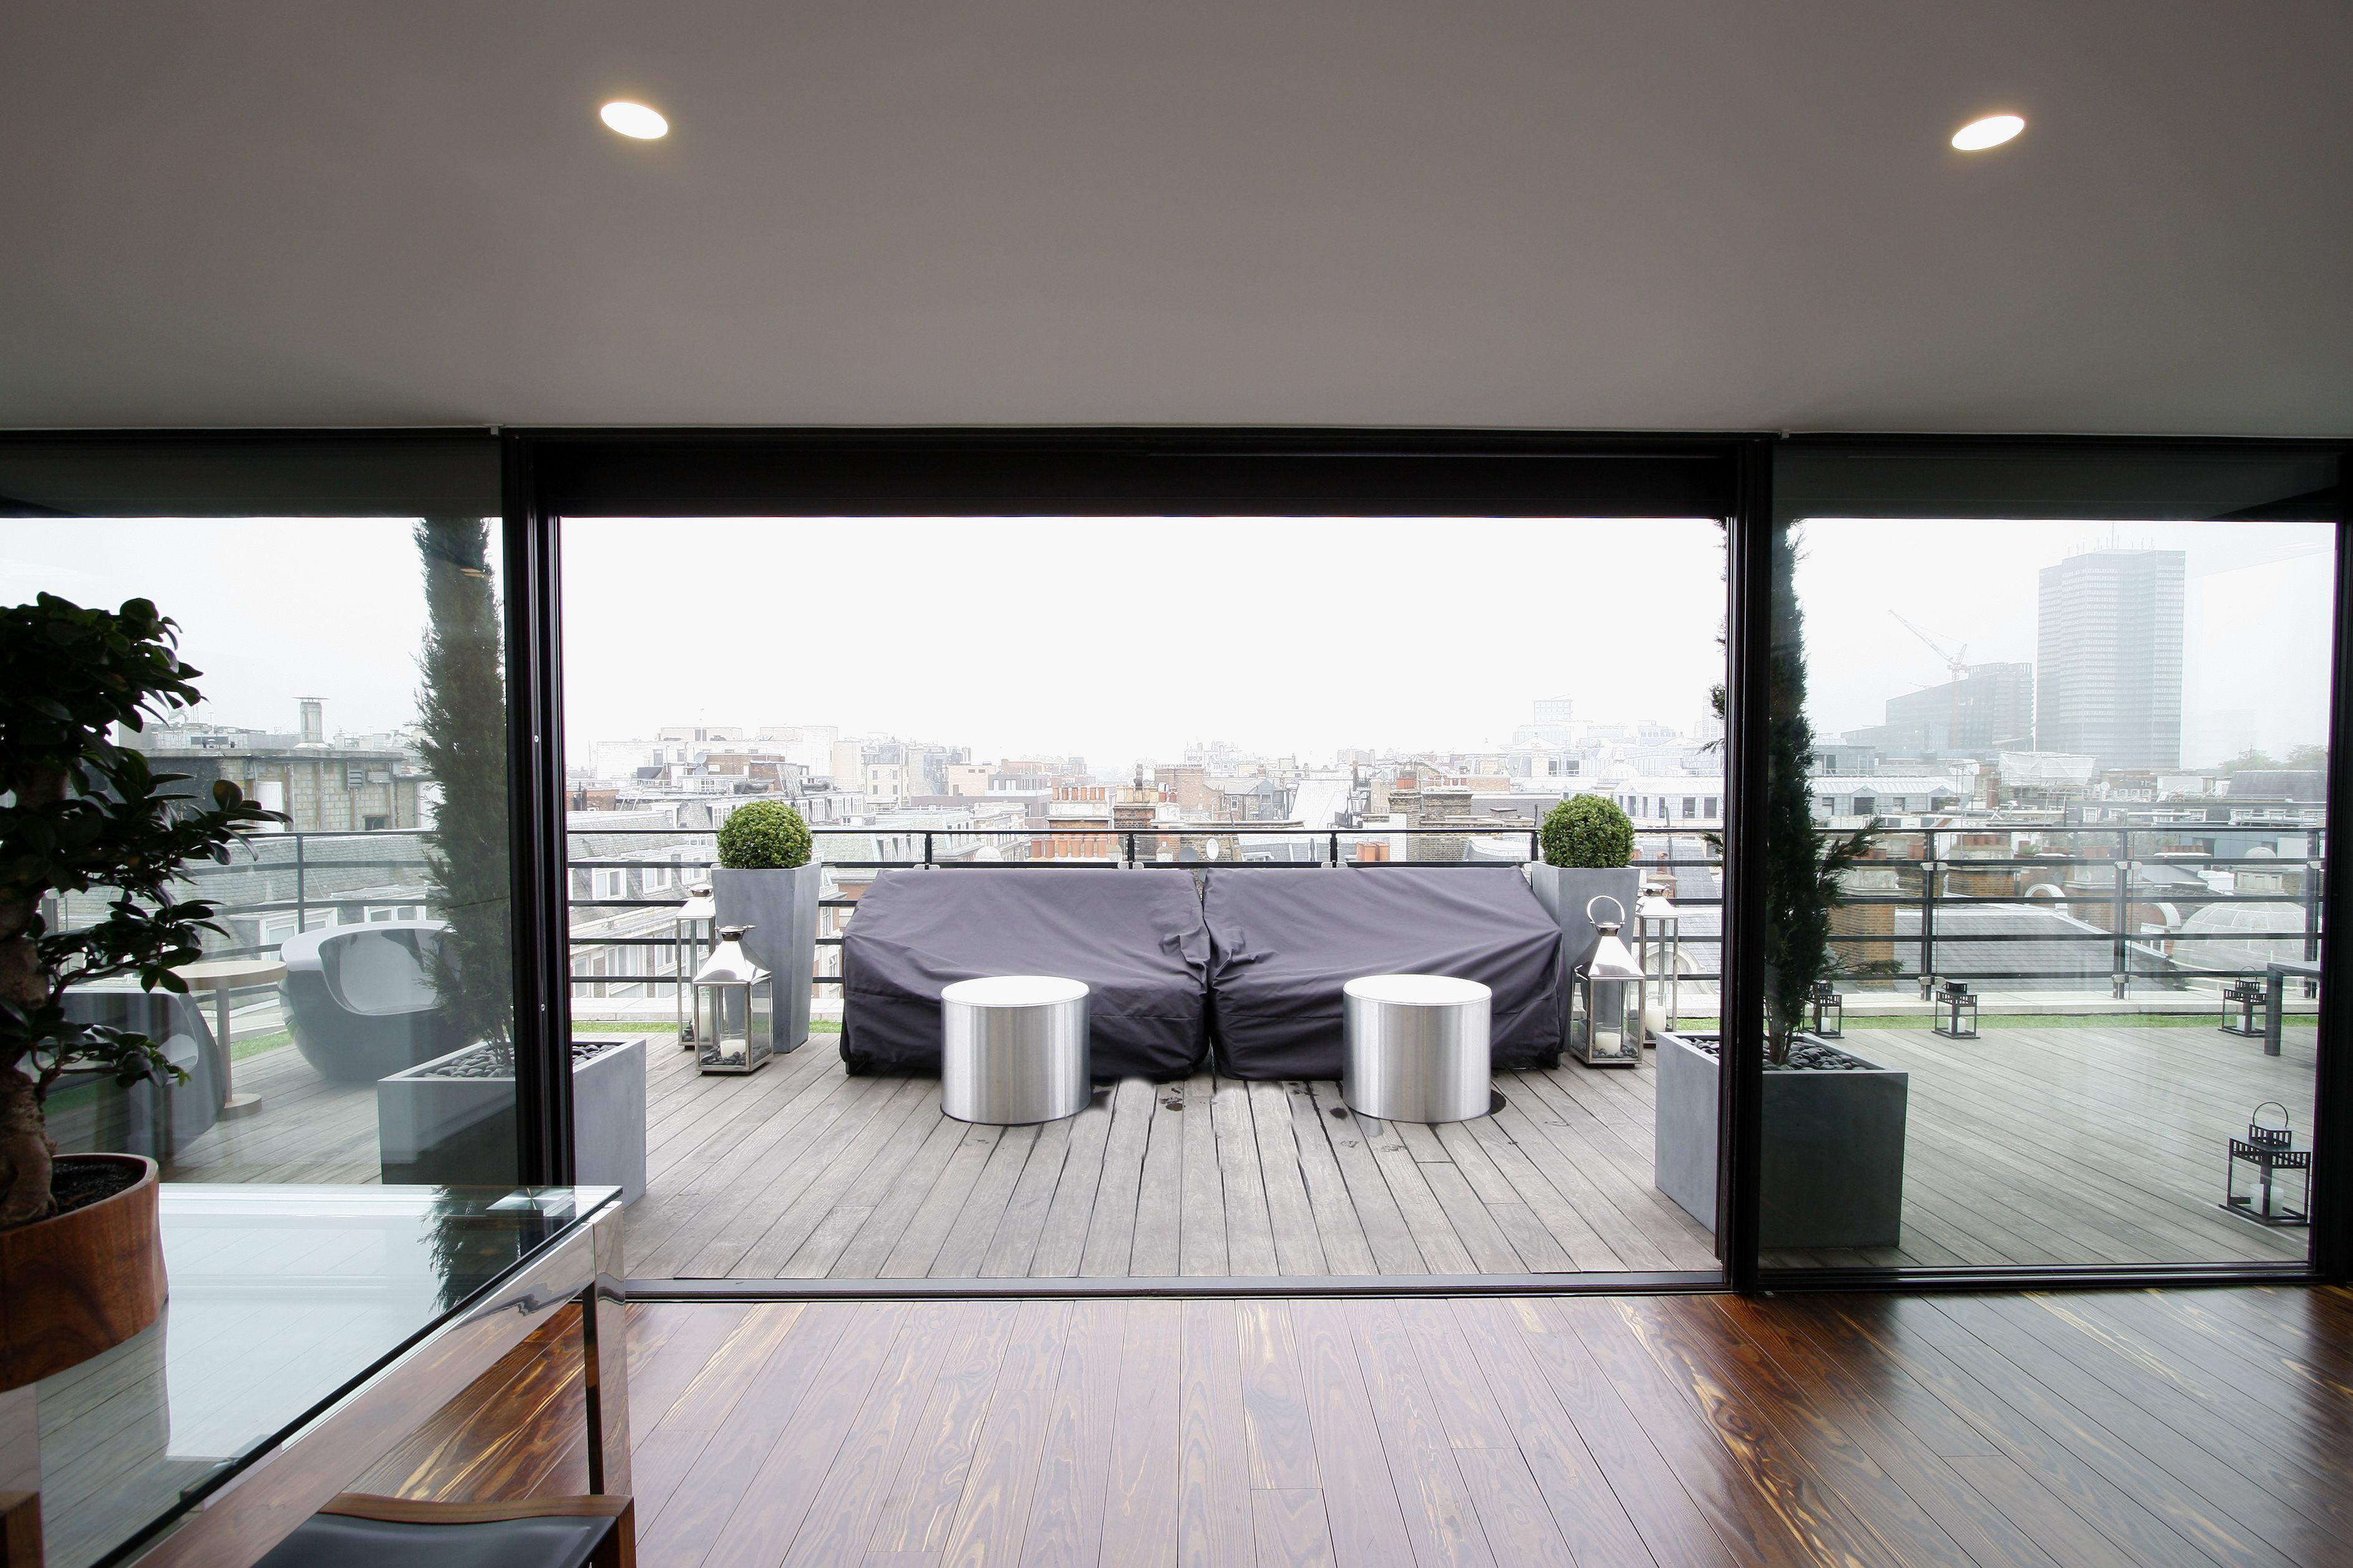 Biparting Minimalwindows On Roofterrace Sliding Glass Door Rooftop Design Minimal Windows